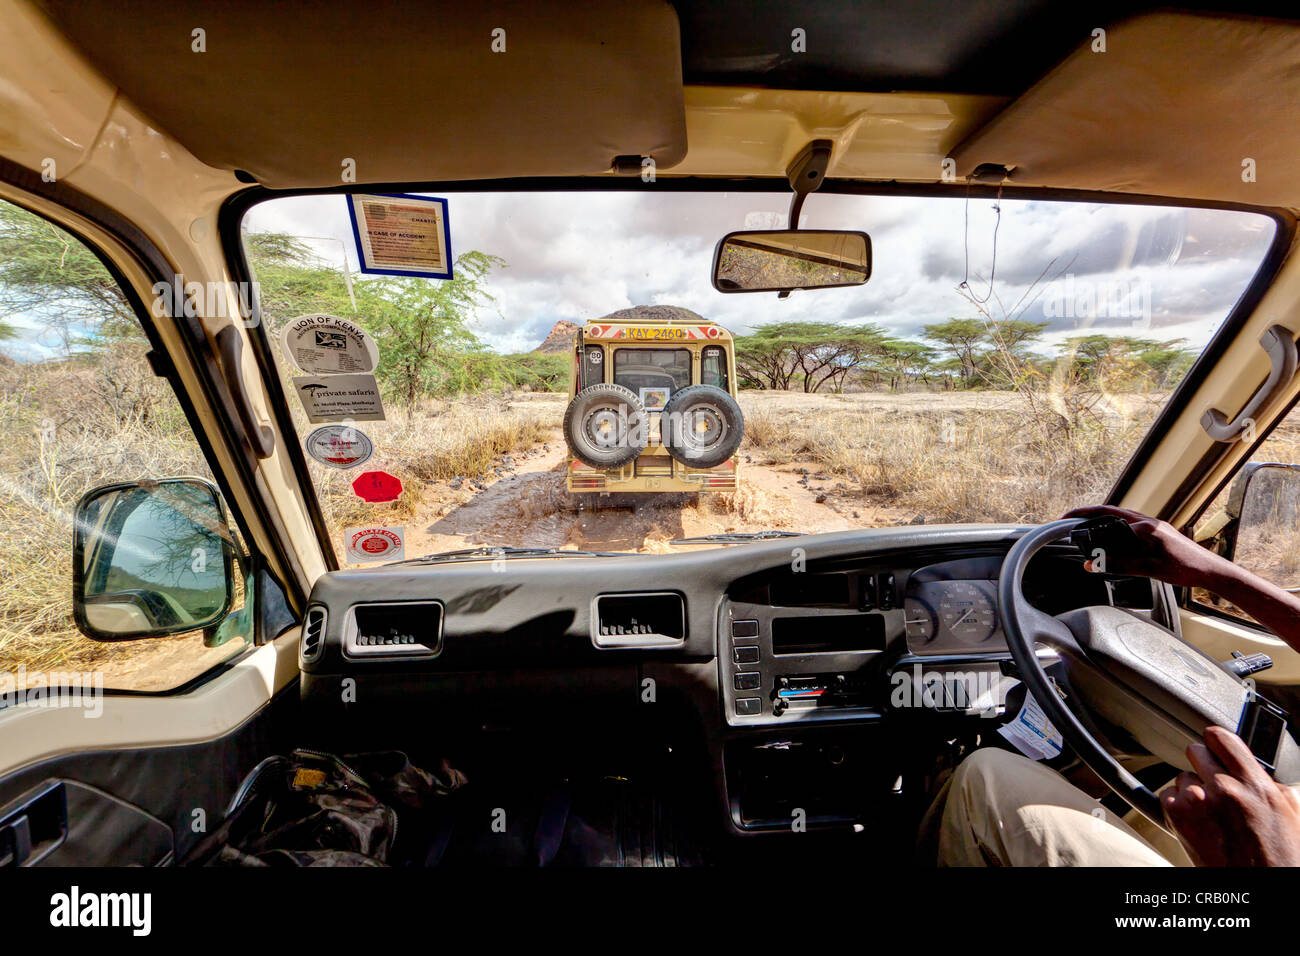 Bus Safari tras un Landrover mojada pistas de tierra en la Reserva Nacional de Samburu, Kenia, África oriental, Imagen De Stock